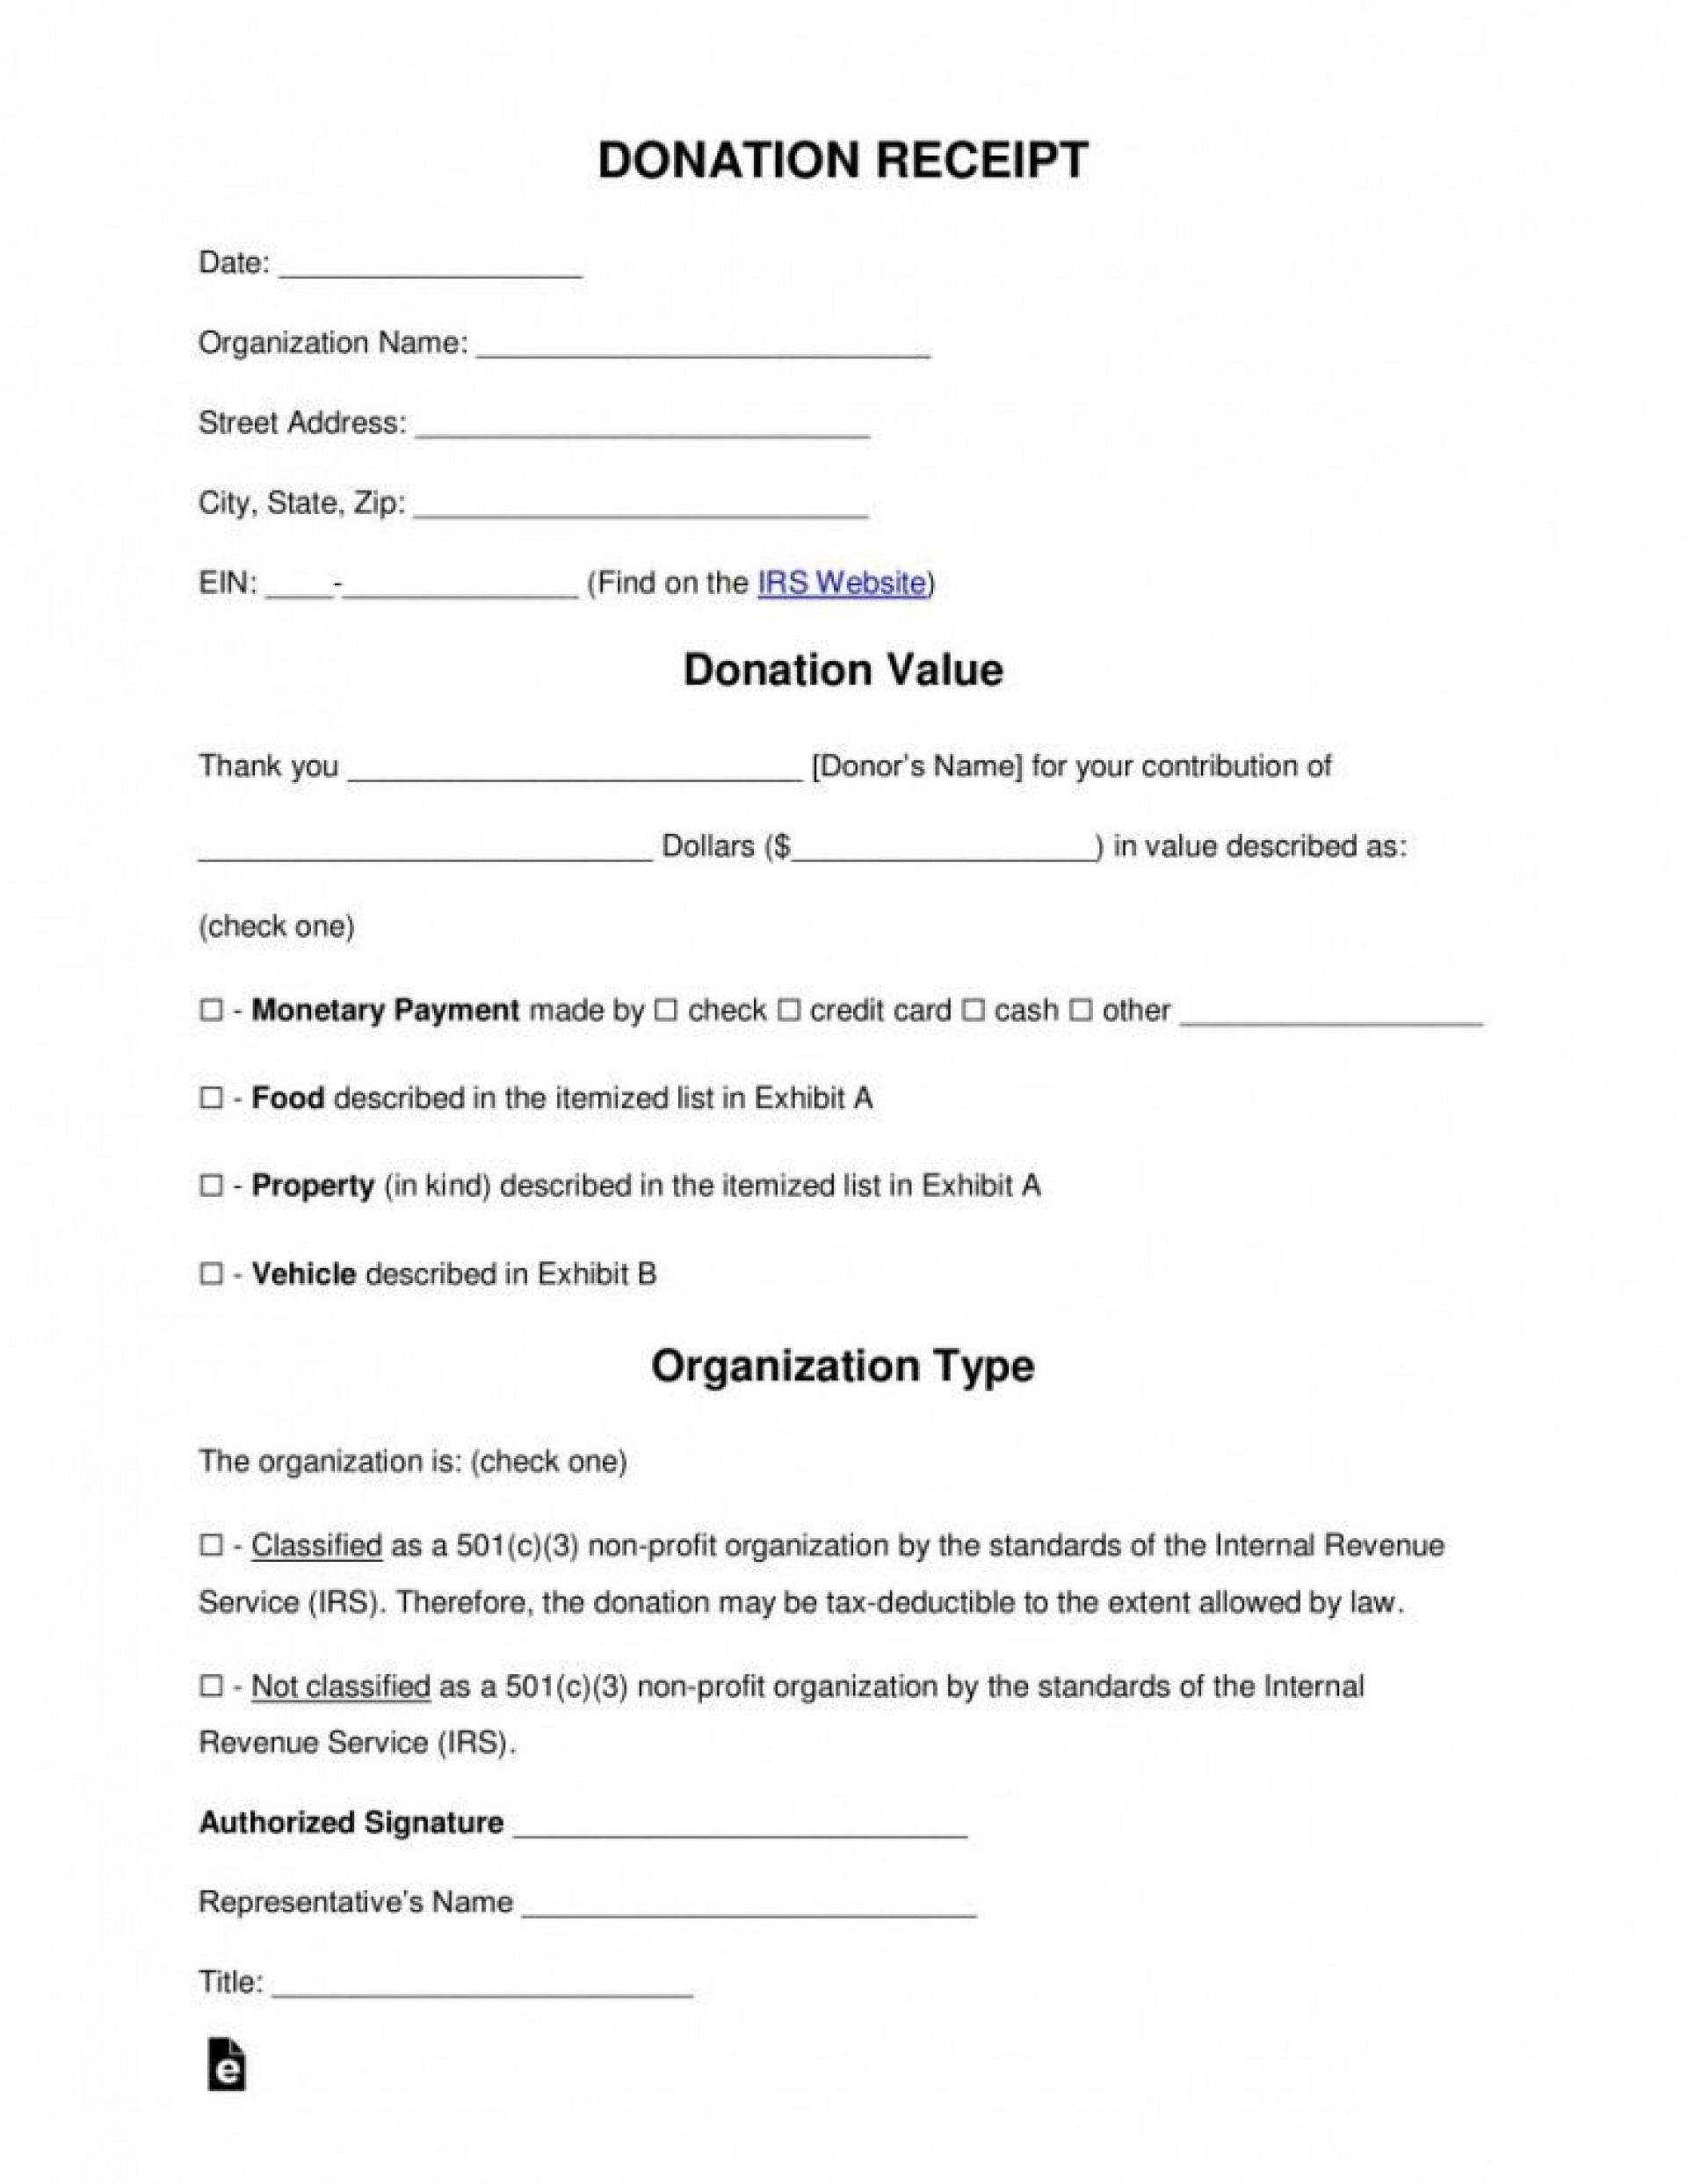 003 Magnificent Tax Deductible Donation Receipt Printable Idea 1920